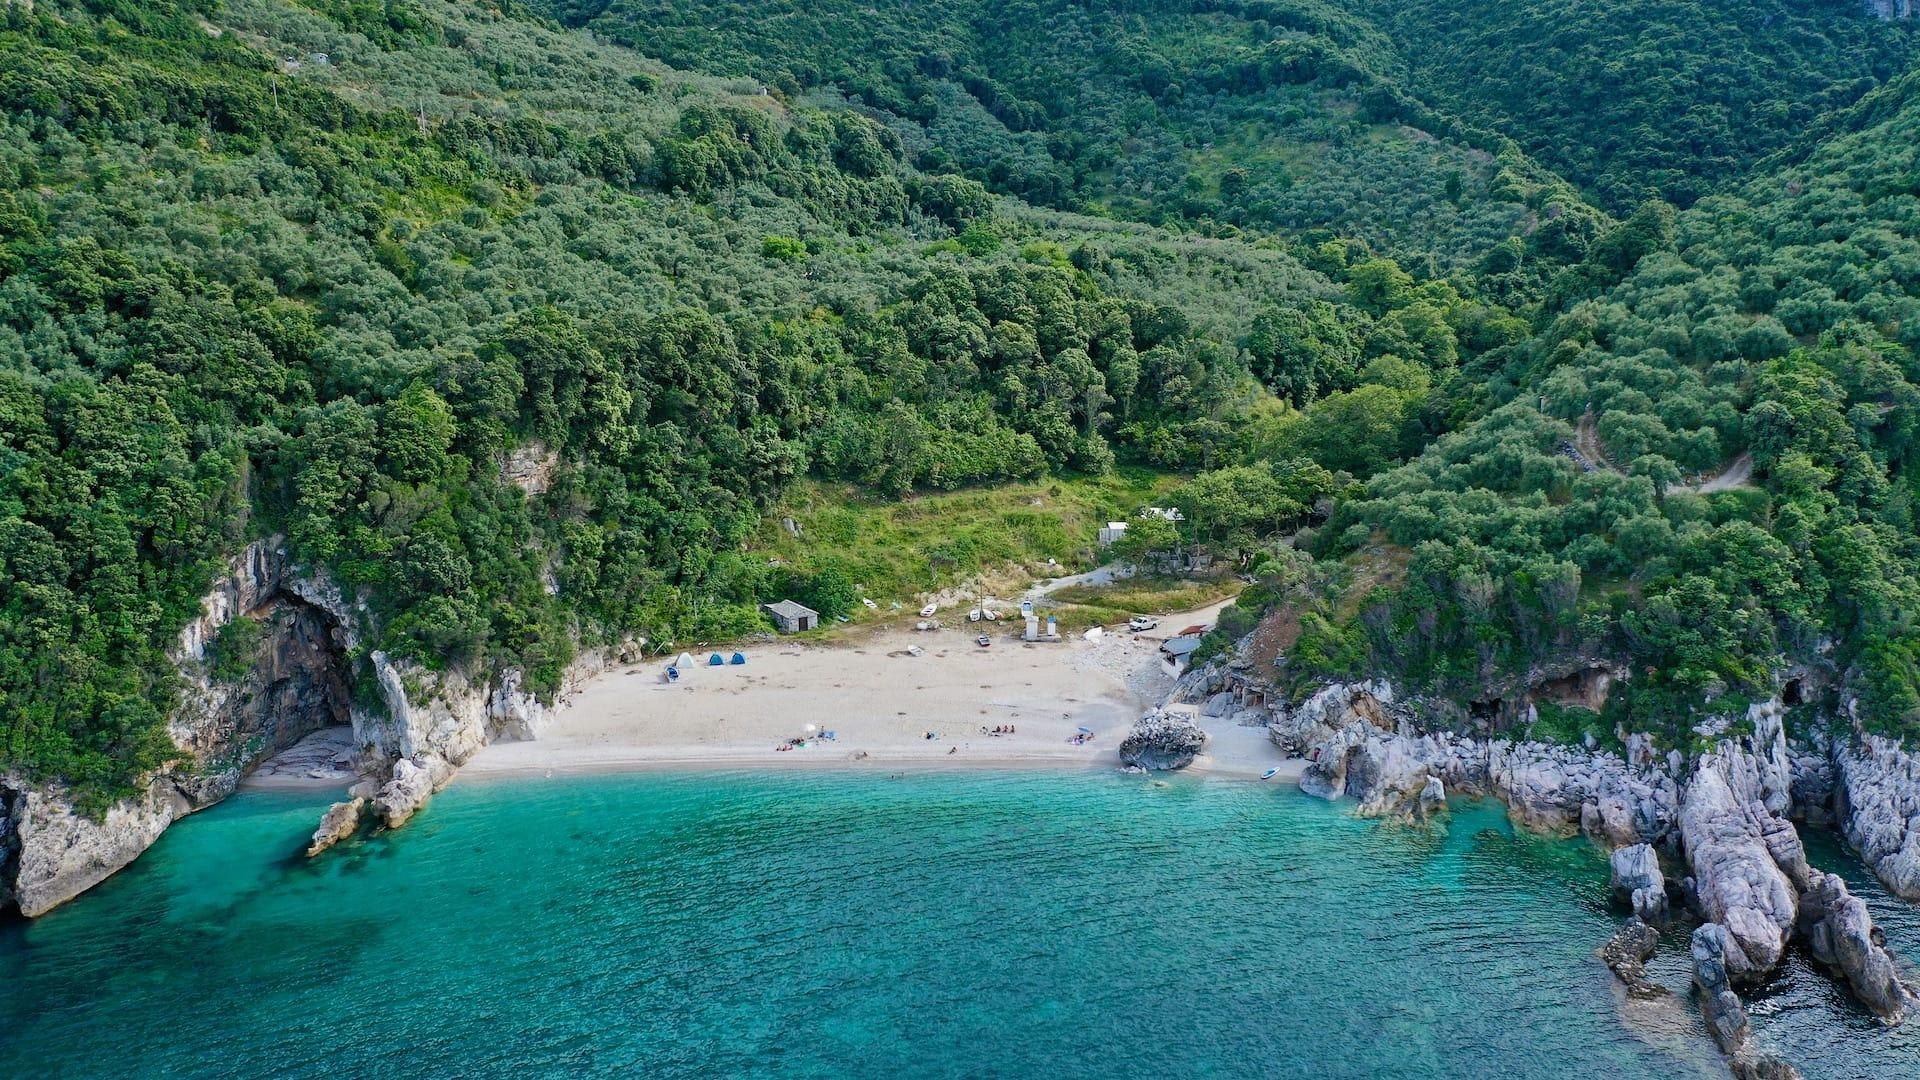 A birds eye photo of the stunning Limnionas beach in Pelion